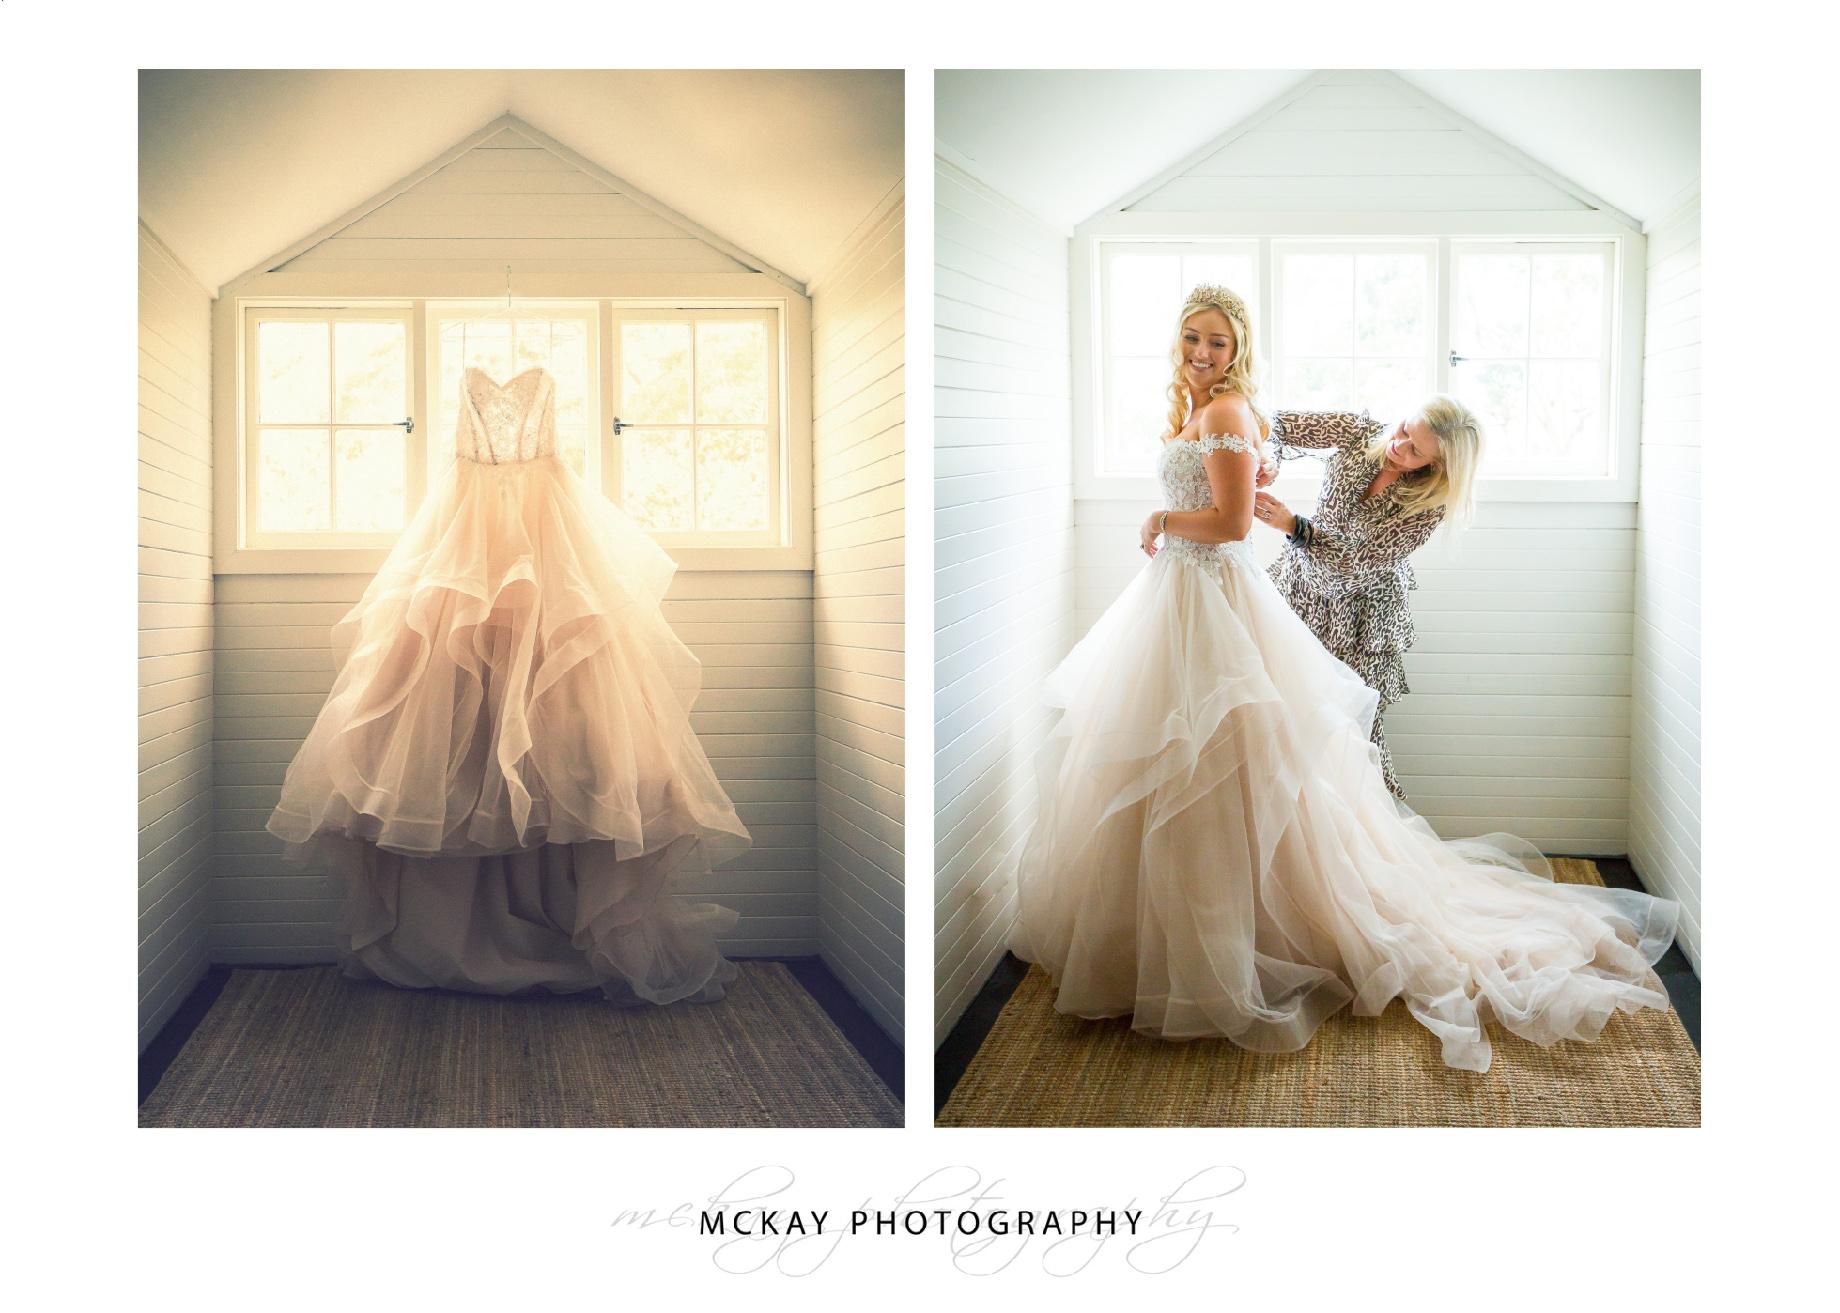 Bride dress preparations